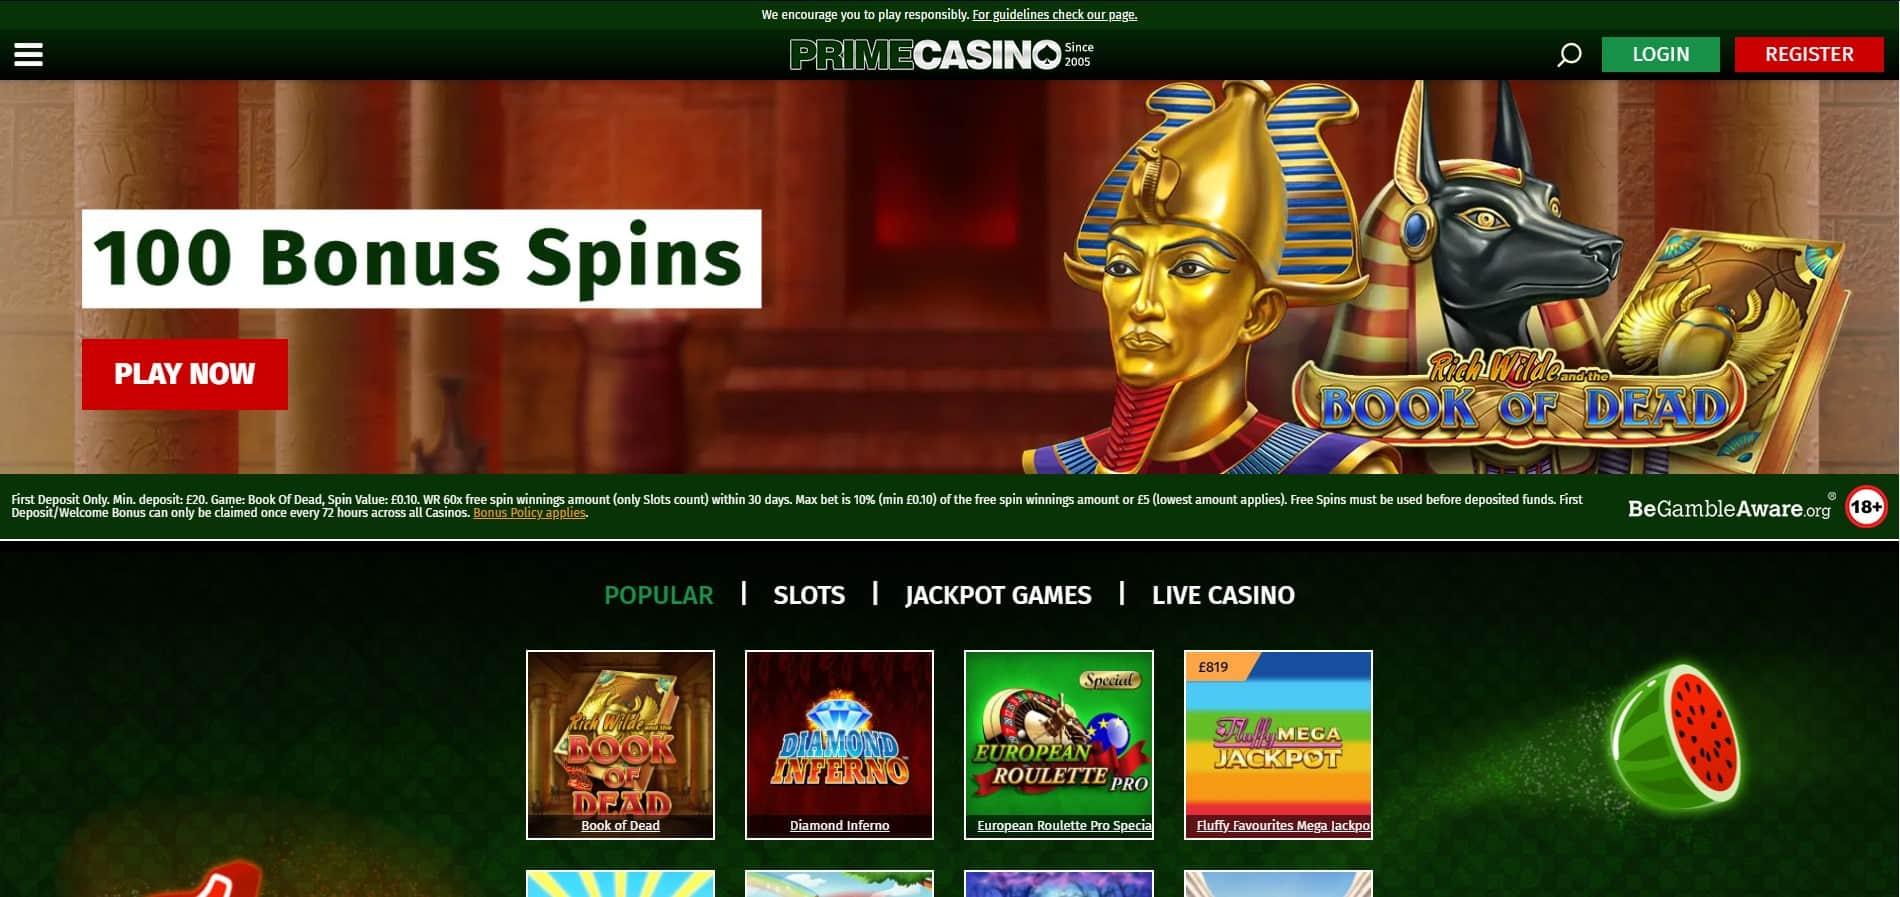 prime casino bonuses